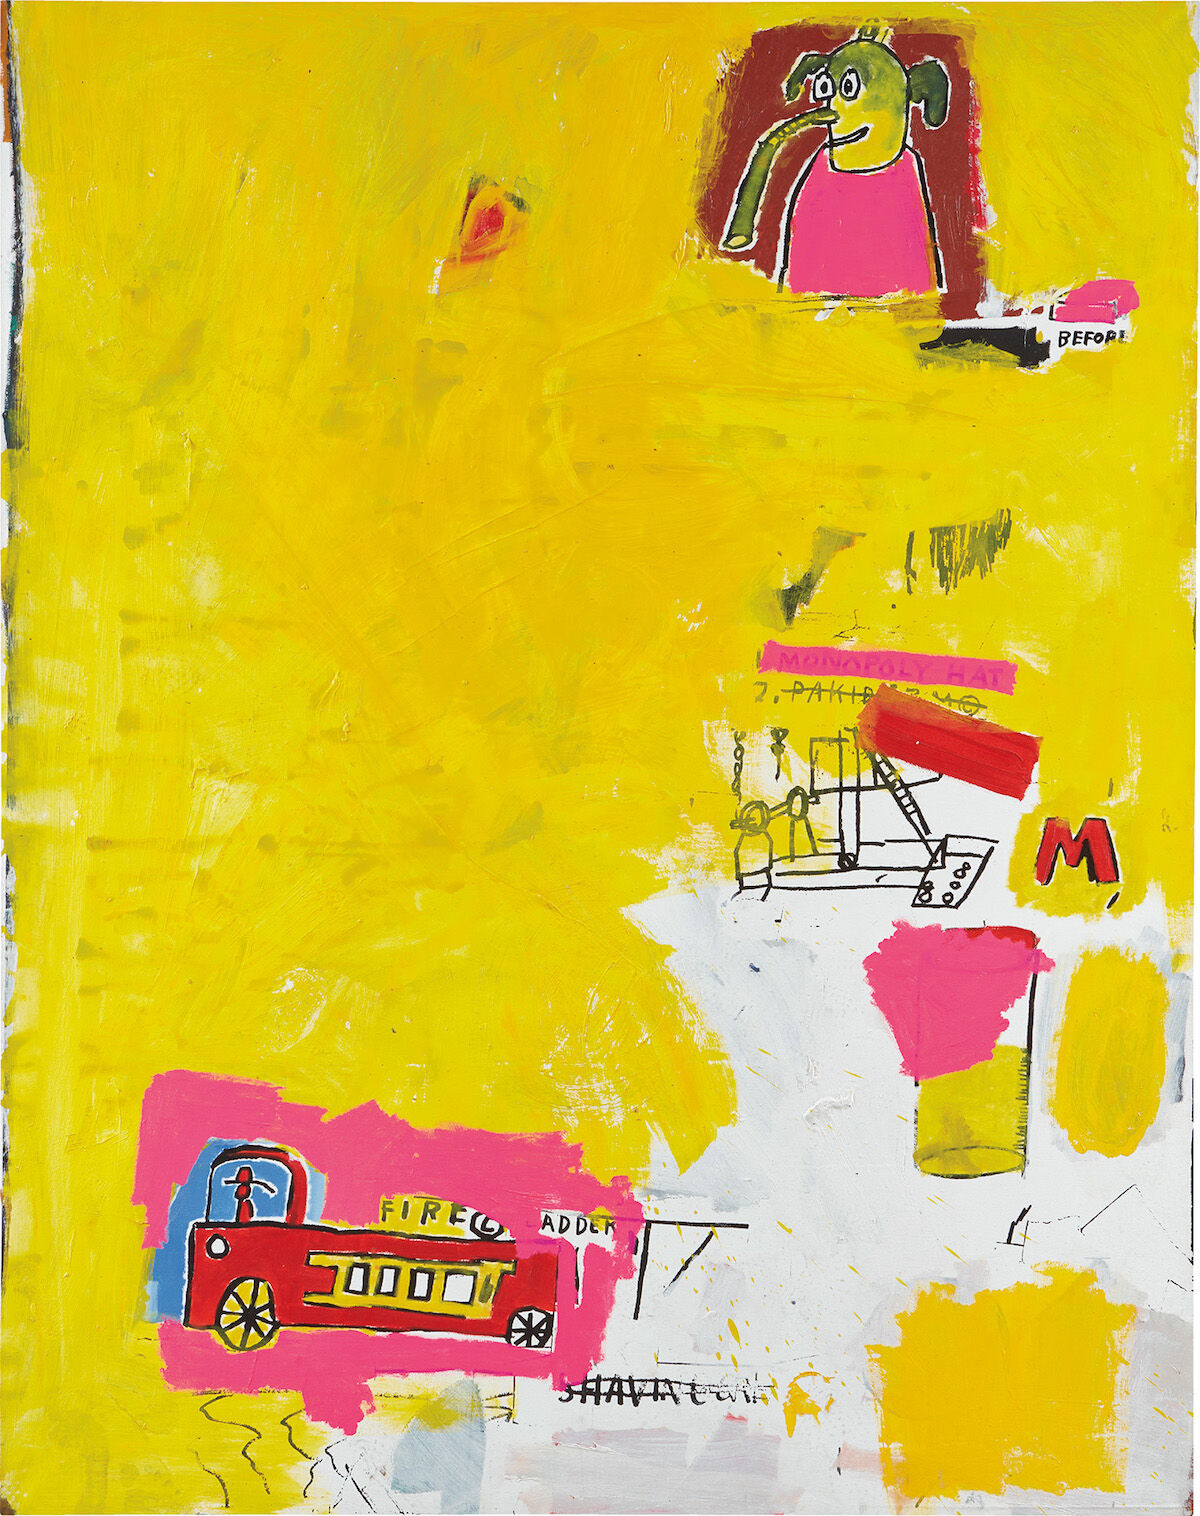 Jean-Michel Basquiat, Pink Elephant with Fire Engine, 1984. Est. £3 million–4 million. Courtesy Phillips.